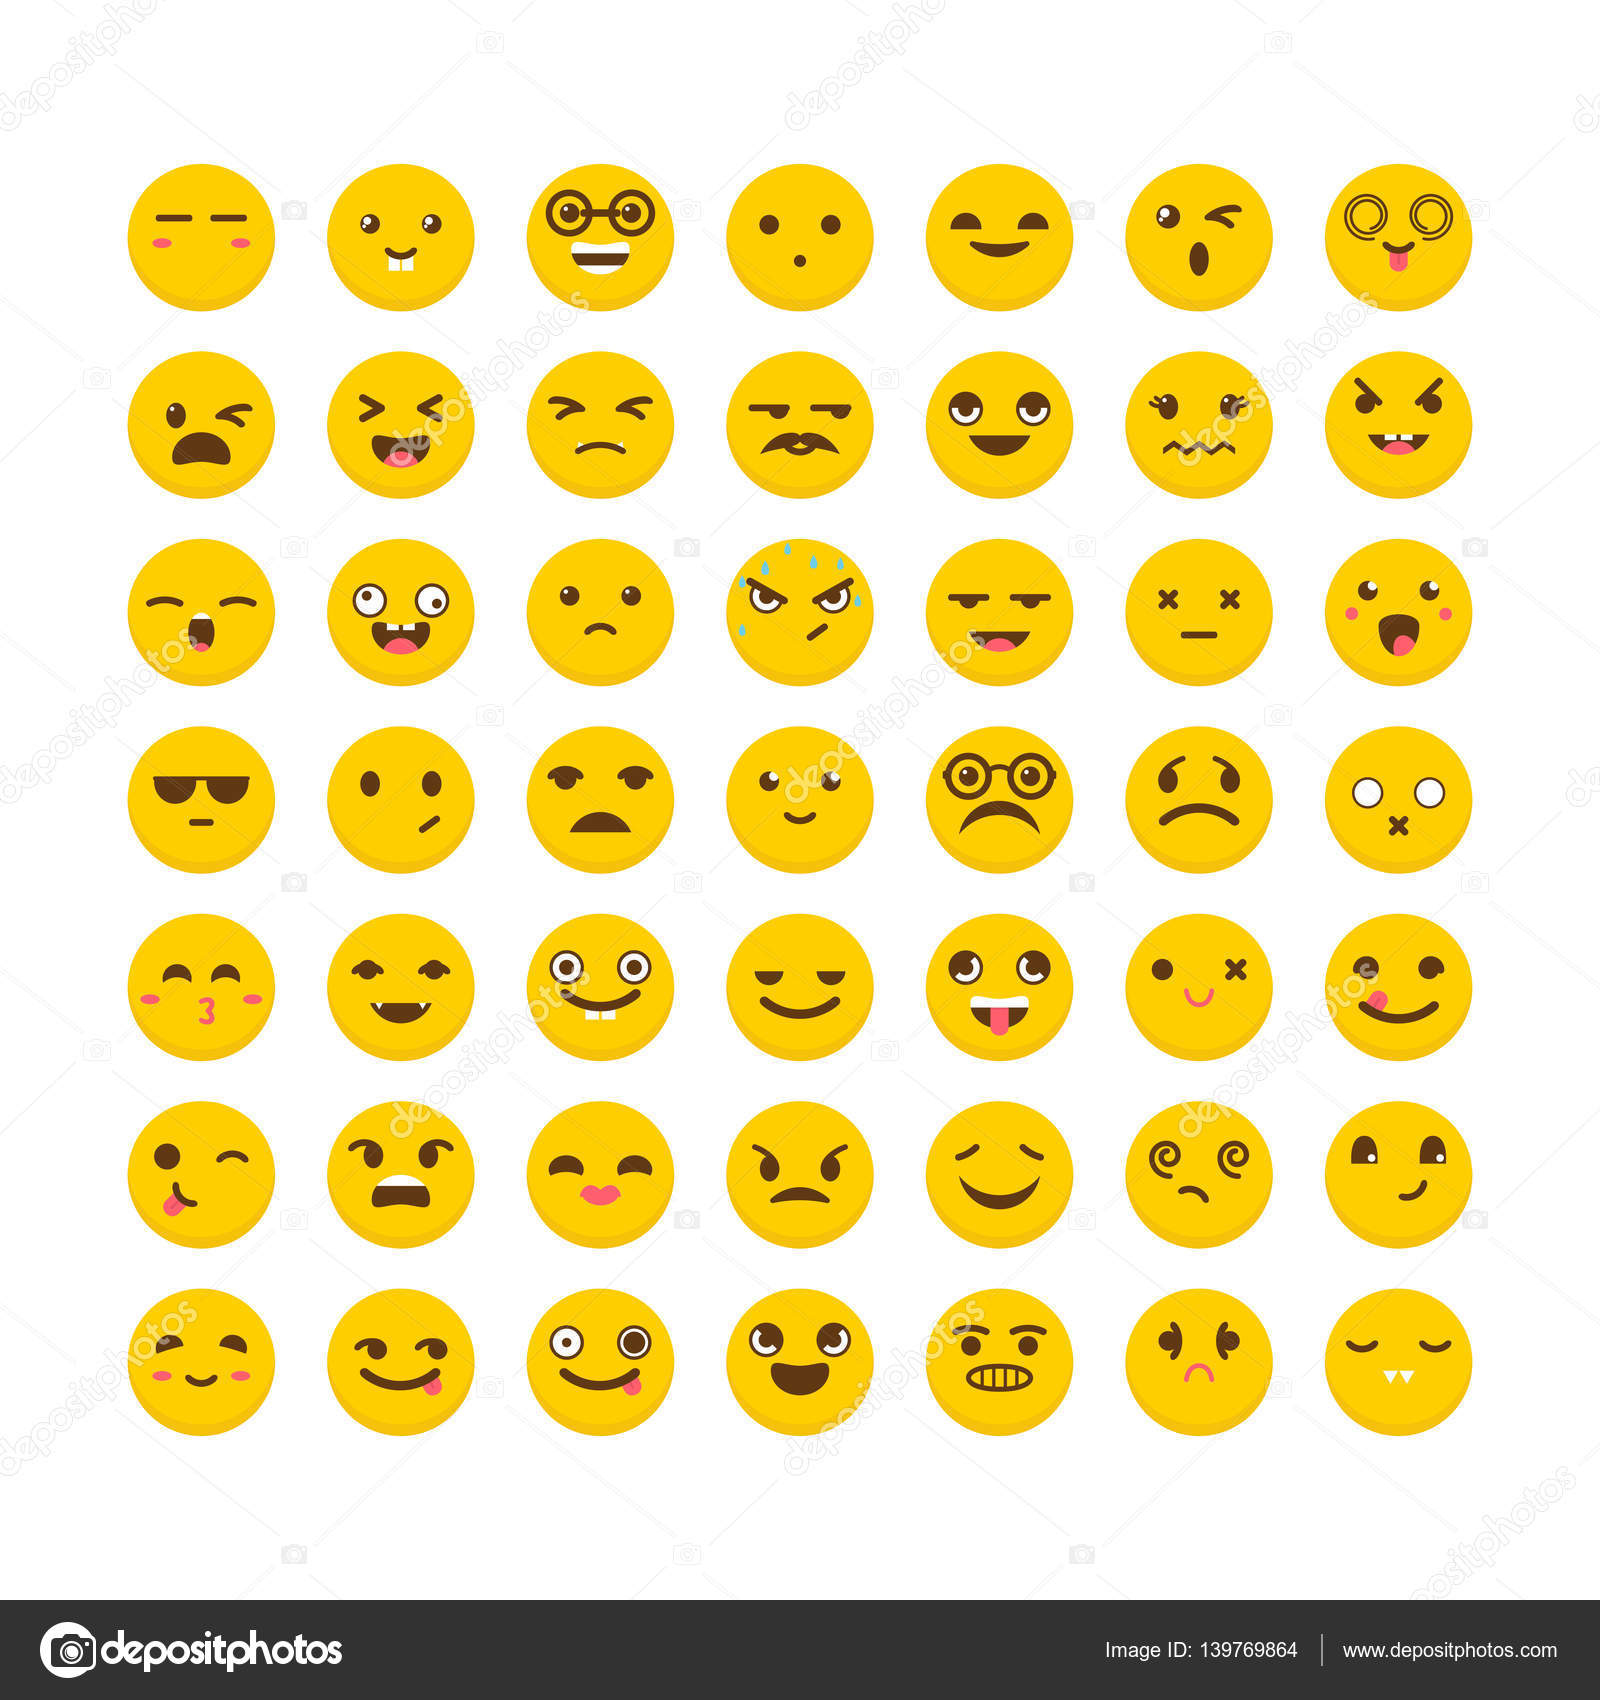 Sada Smajliku Roztomily Emoji Ikony Avatary Vtipne Kreslene